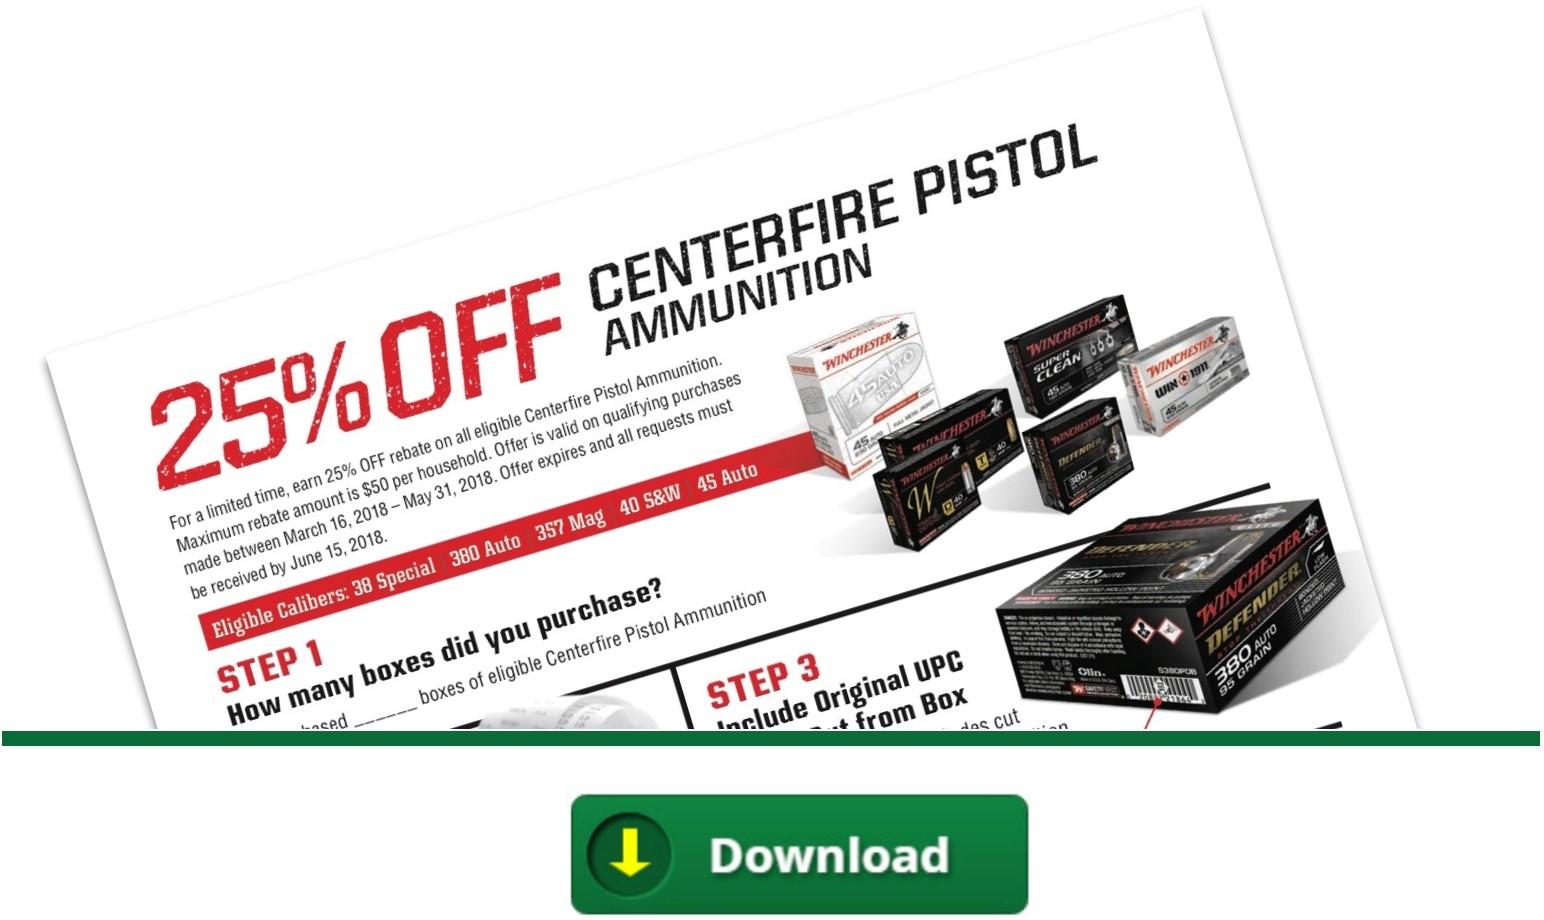 Winchester Centerfire Pistol Ammo Rebate - Spring 2018